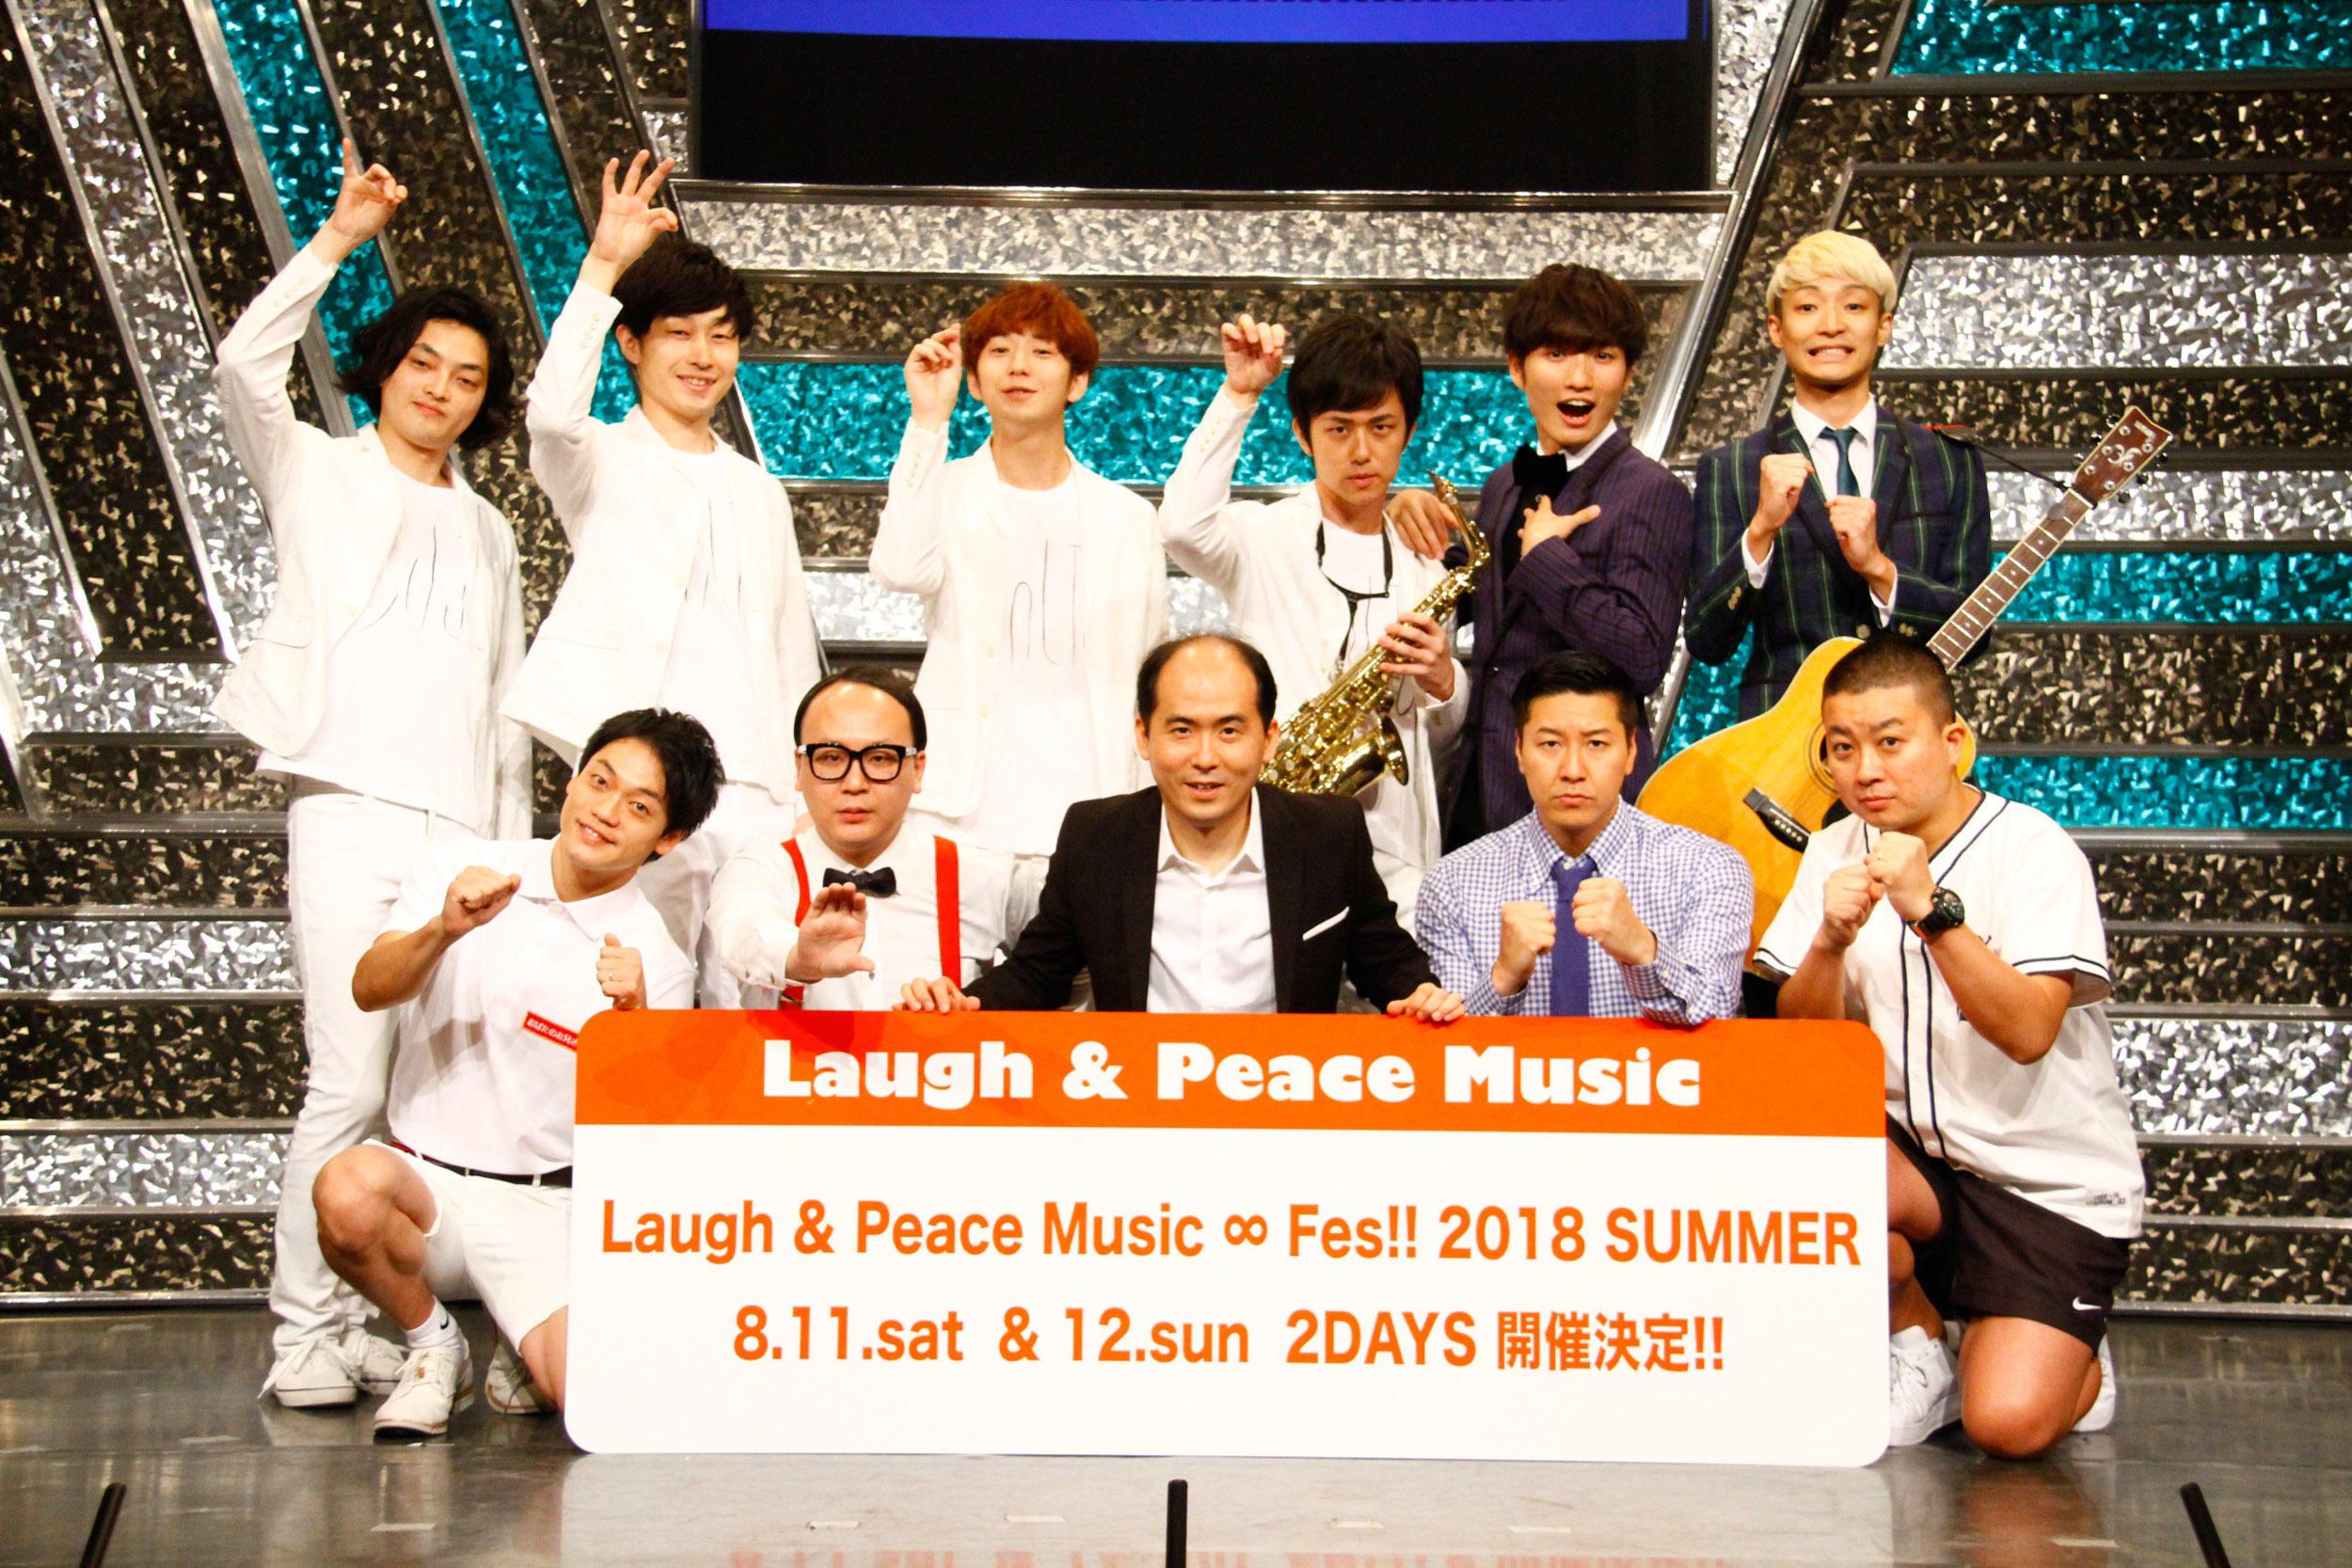 http://news.yoshimoto.co.jp/20180628164016-c5d8a84361c561980501e6909c11c784b8c03e86.jpg